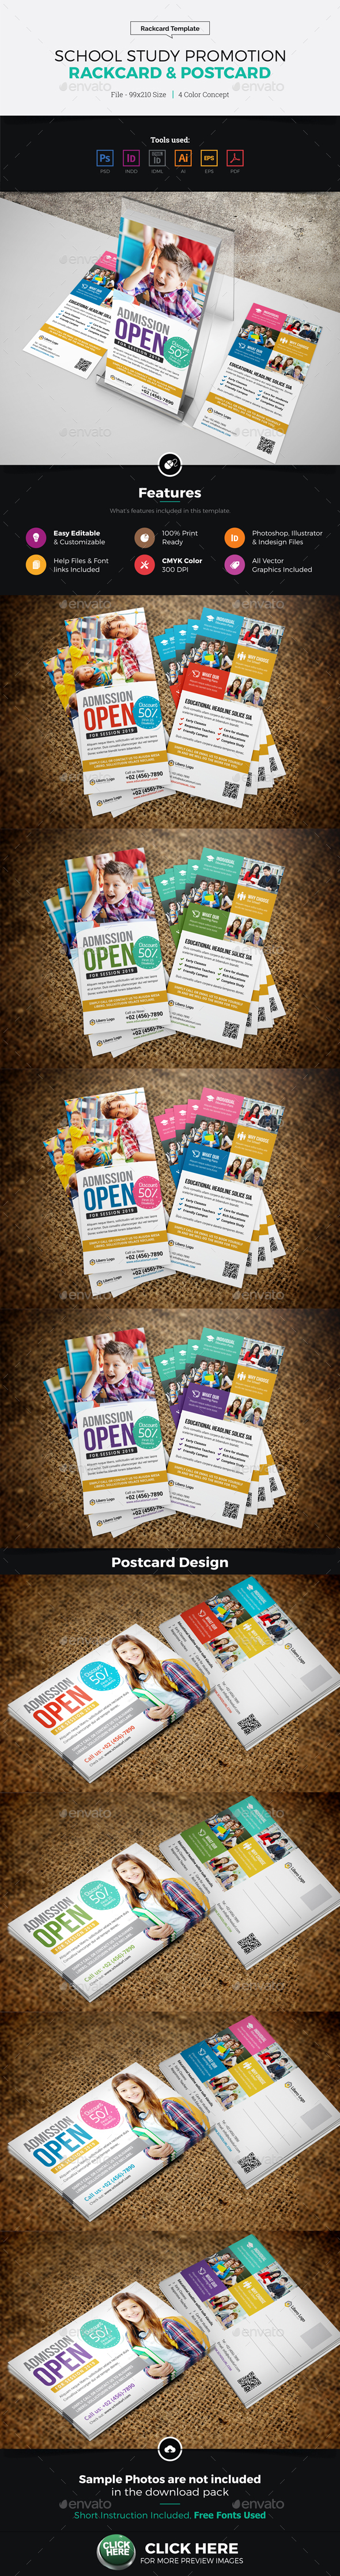 School Study Promotion Rackcard Postcard Design - Cards & Invites Print Templates